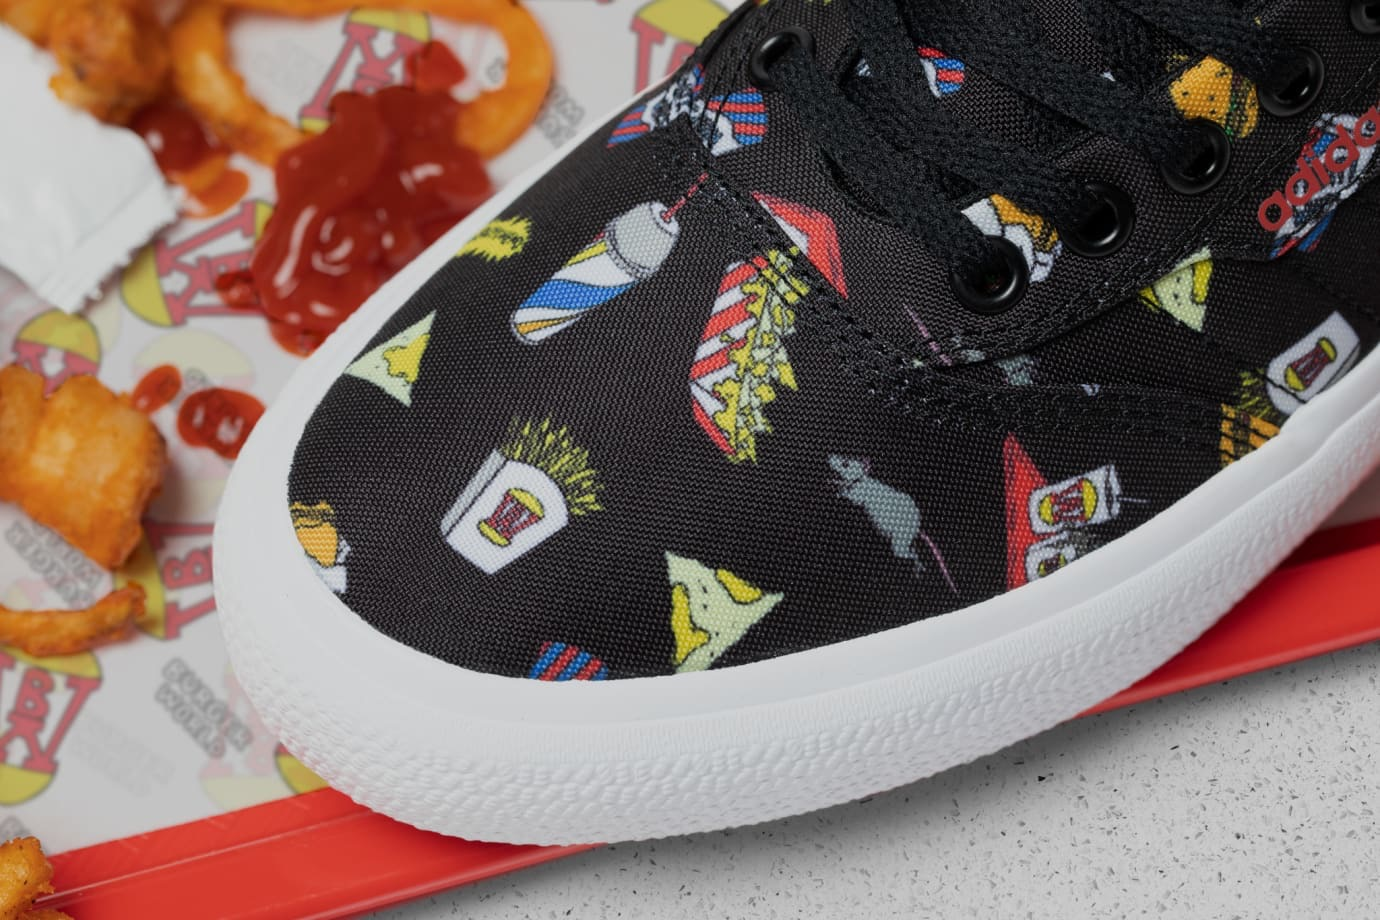 Beavis amp; Skateboarding Butthead X Sneakers Adidas qvdFqBpn